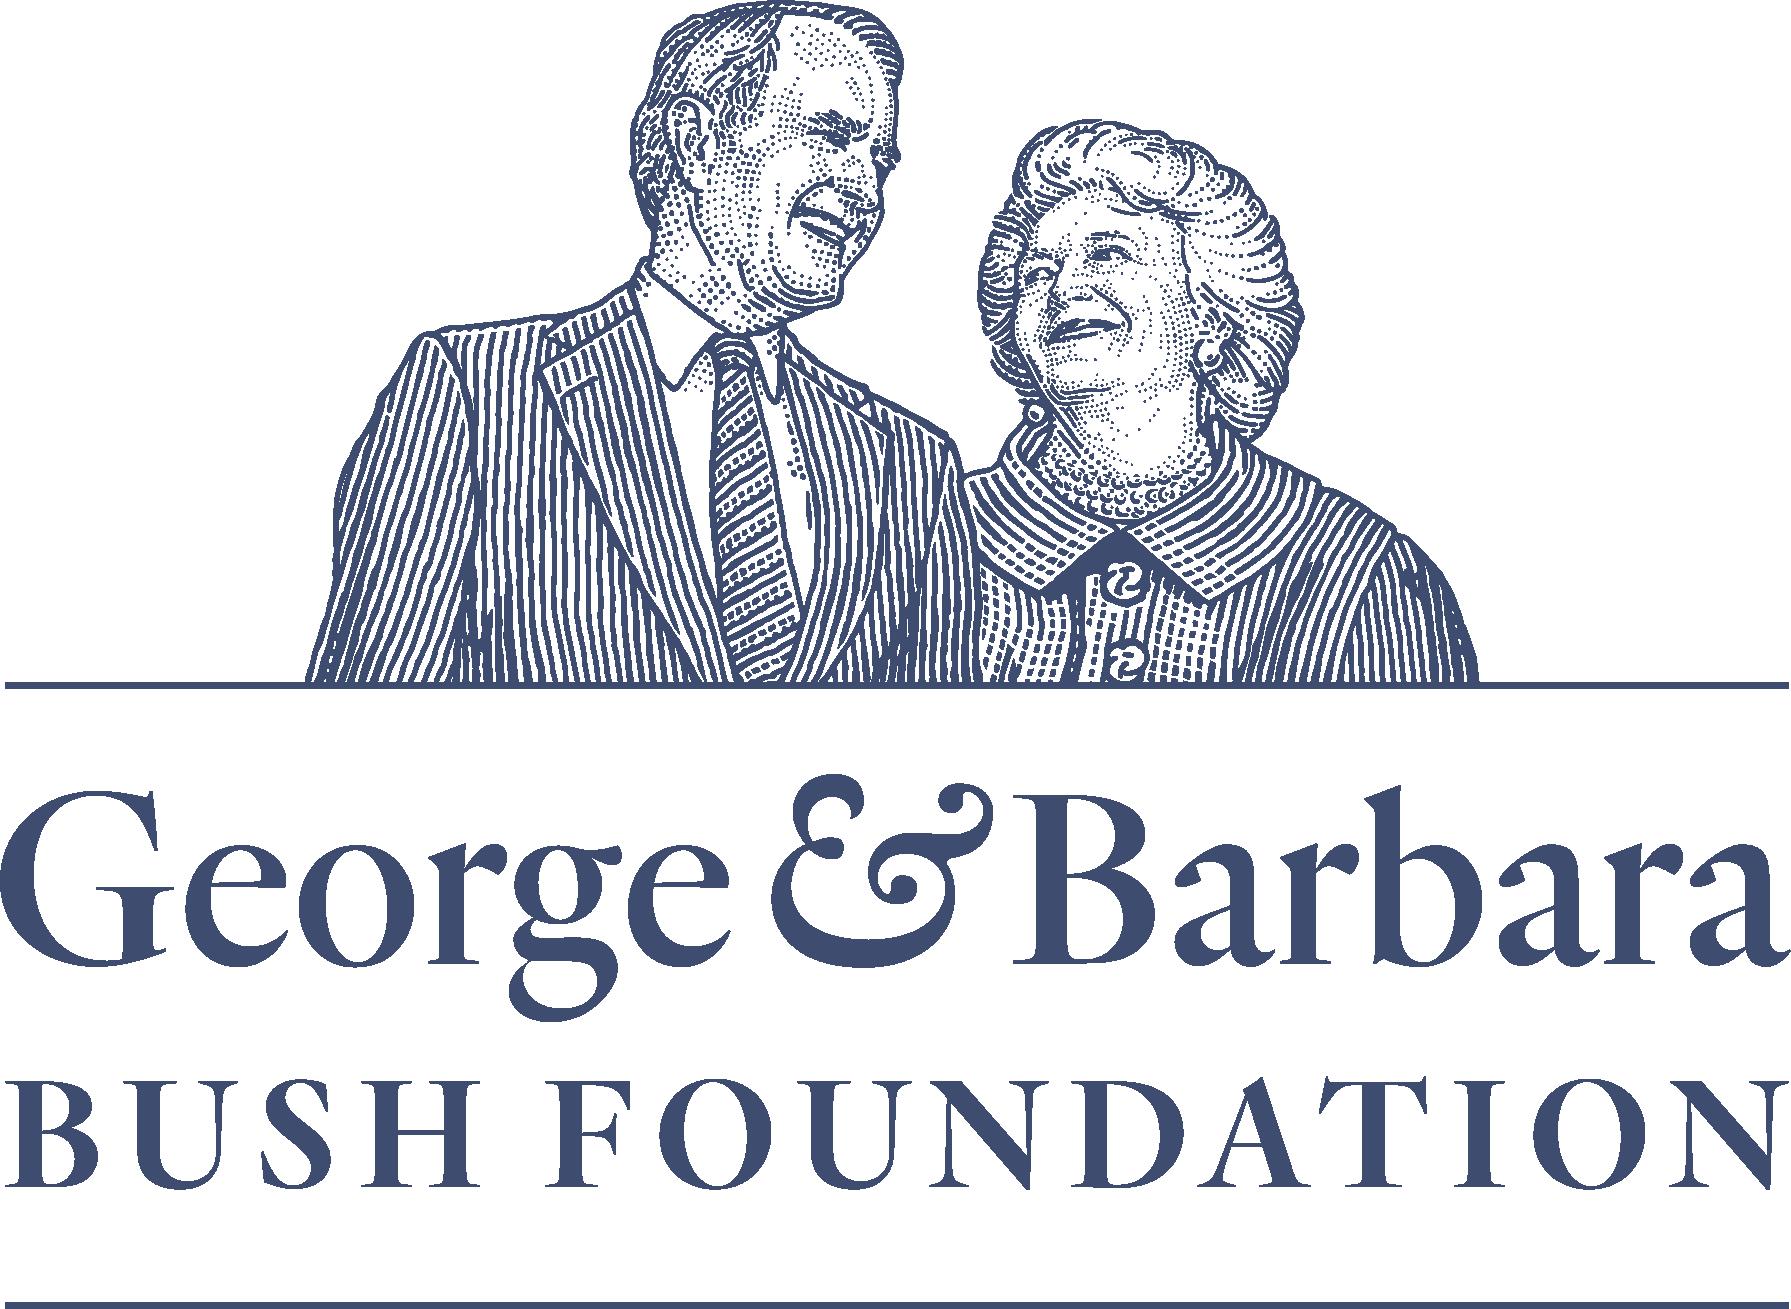 The George and Barbara Bush Foundation Logo